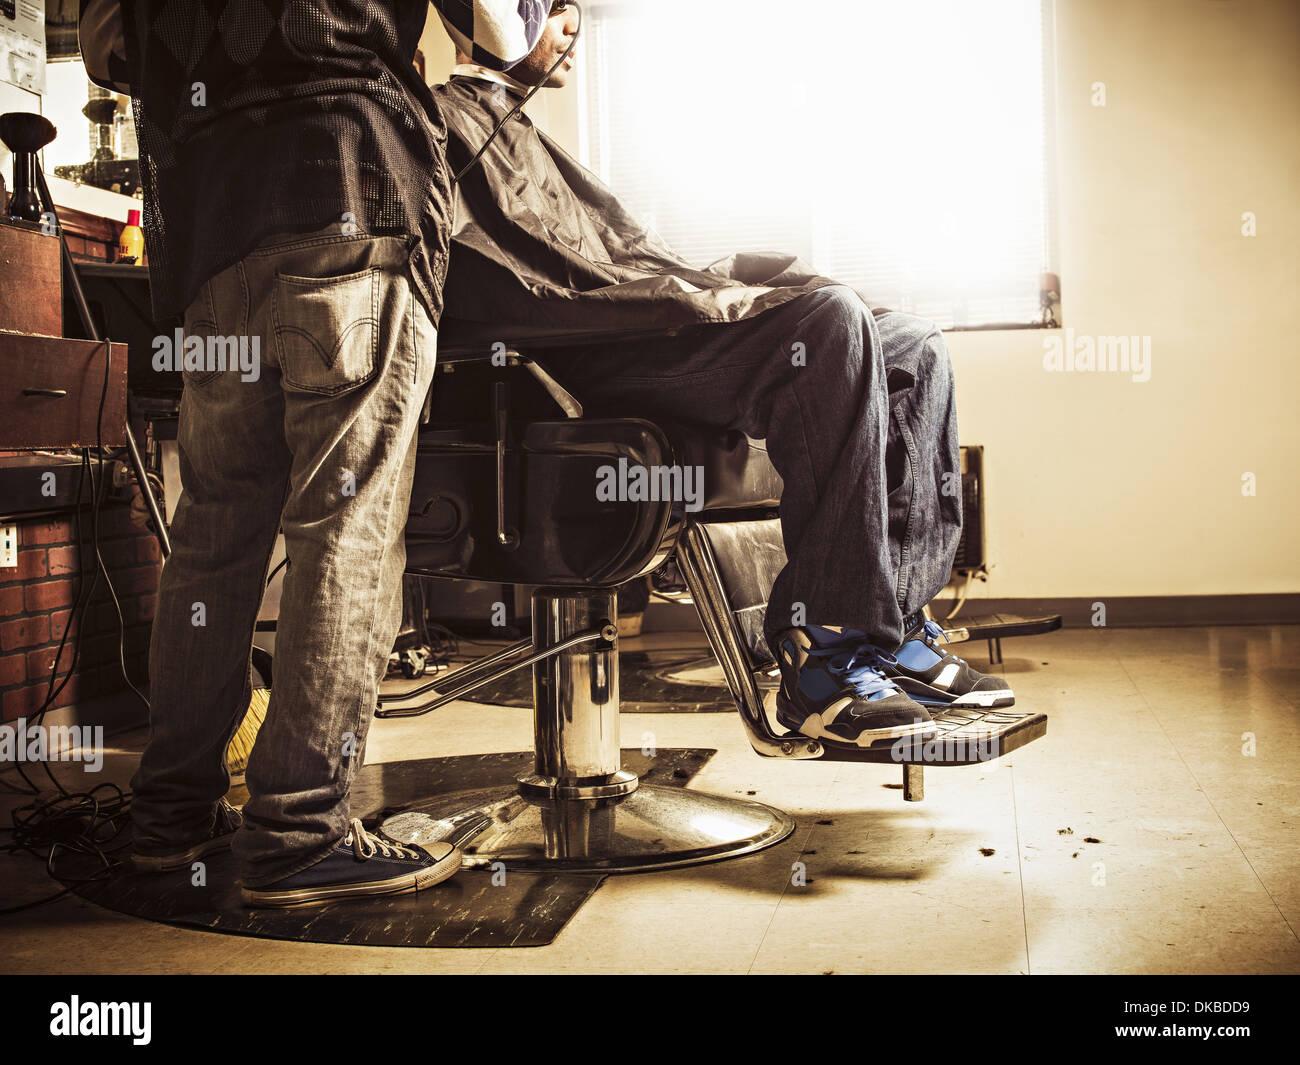 Barber in traditional barber shop shaving man's head - Stock Image